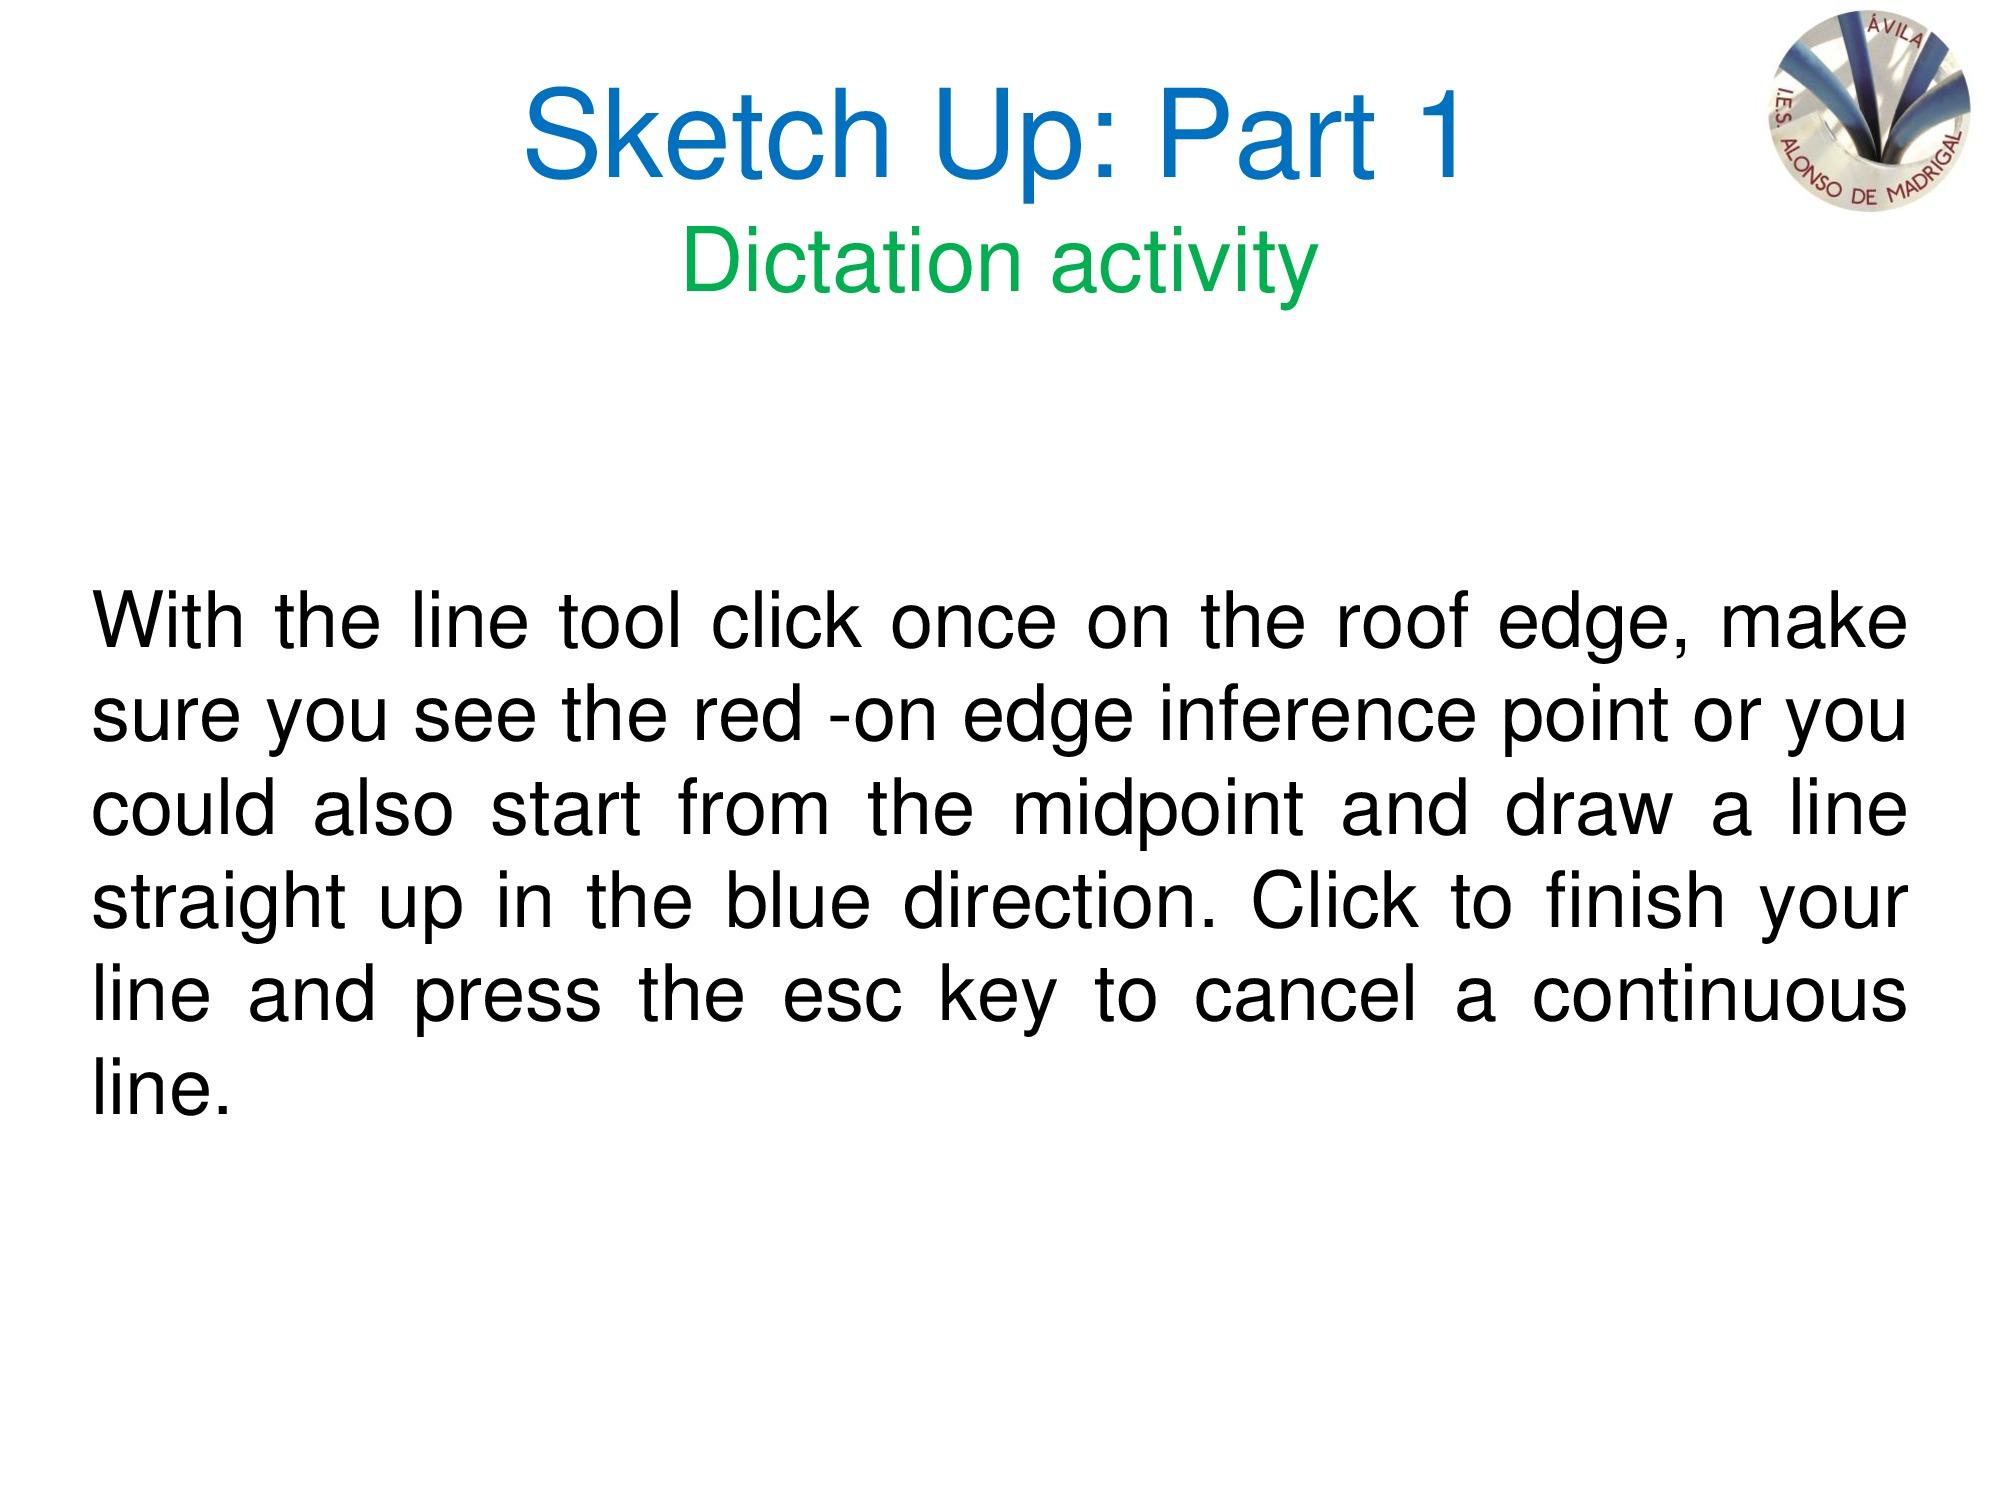 Sketch Up: Part 1 Dictation activity